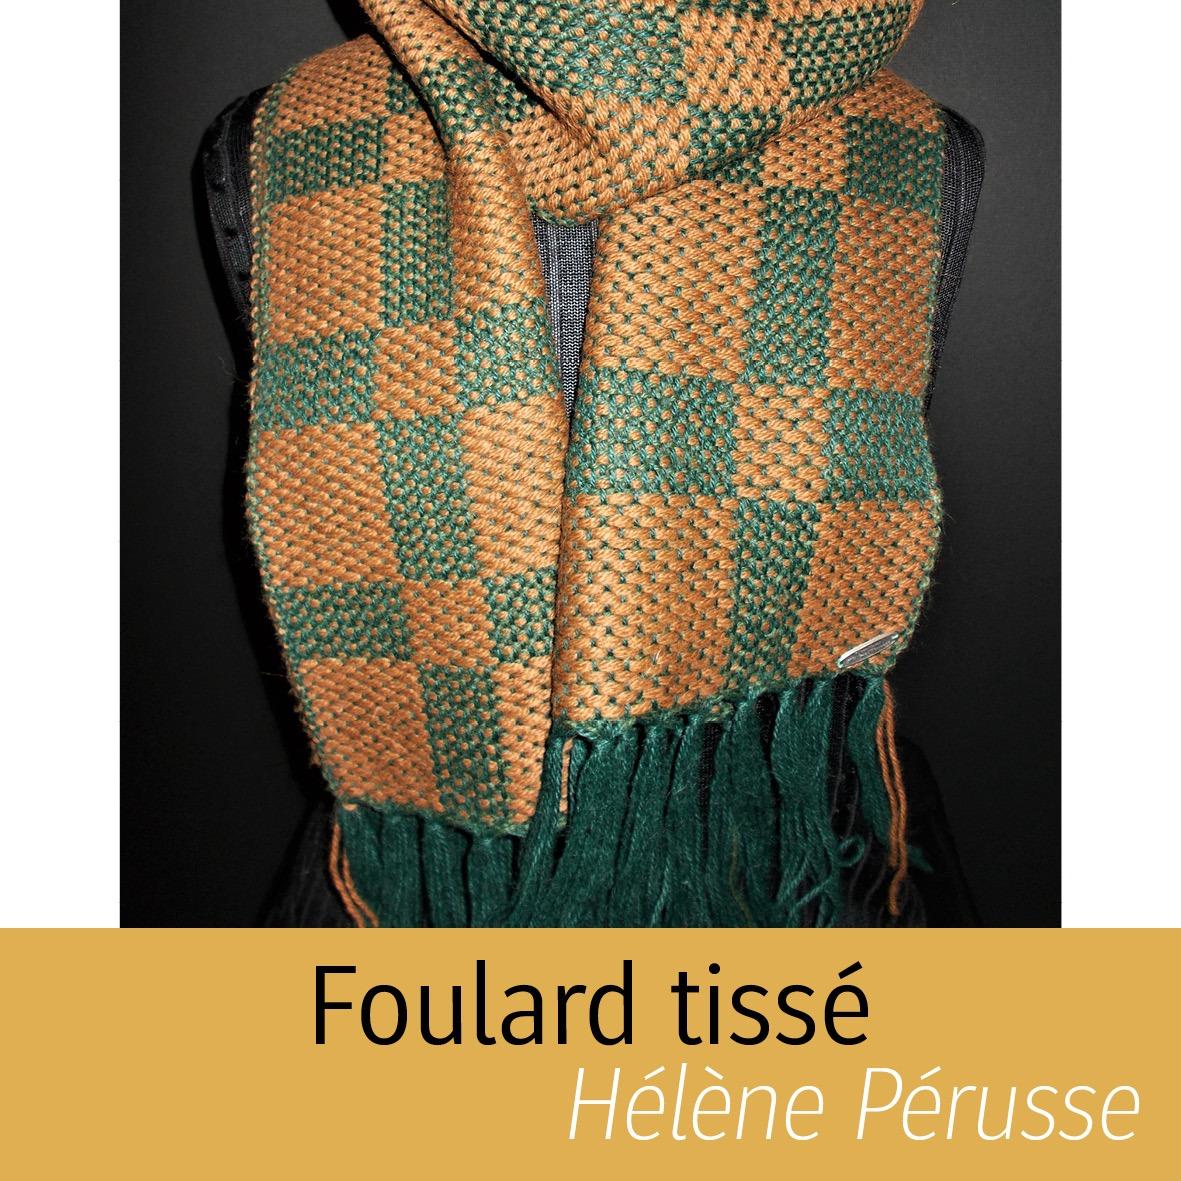 Foulard Tissé Hélène Pérusse